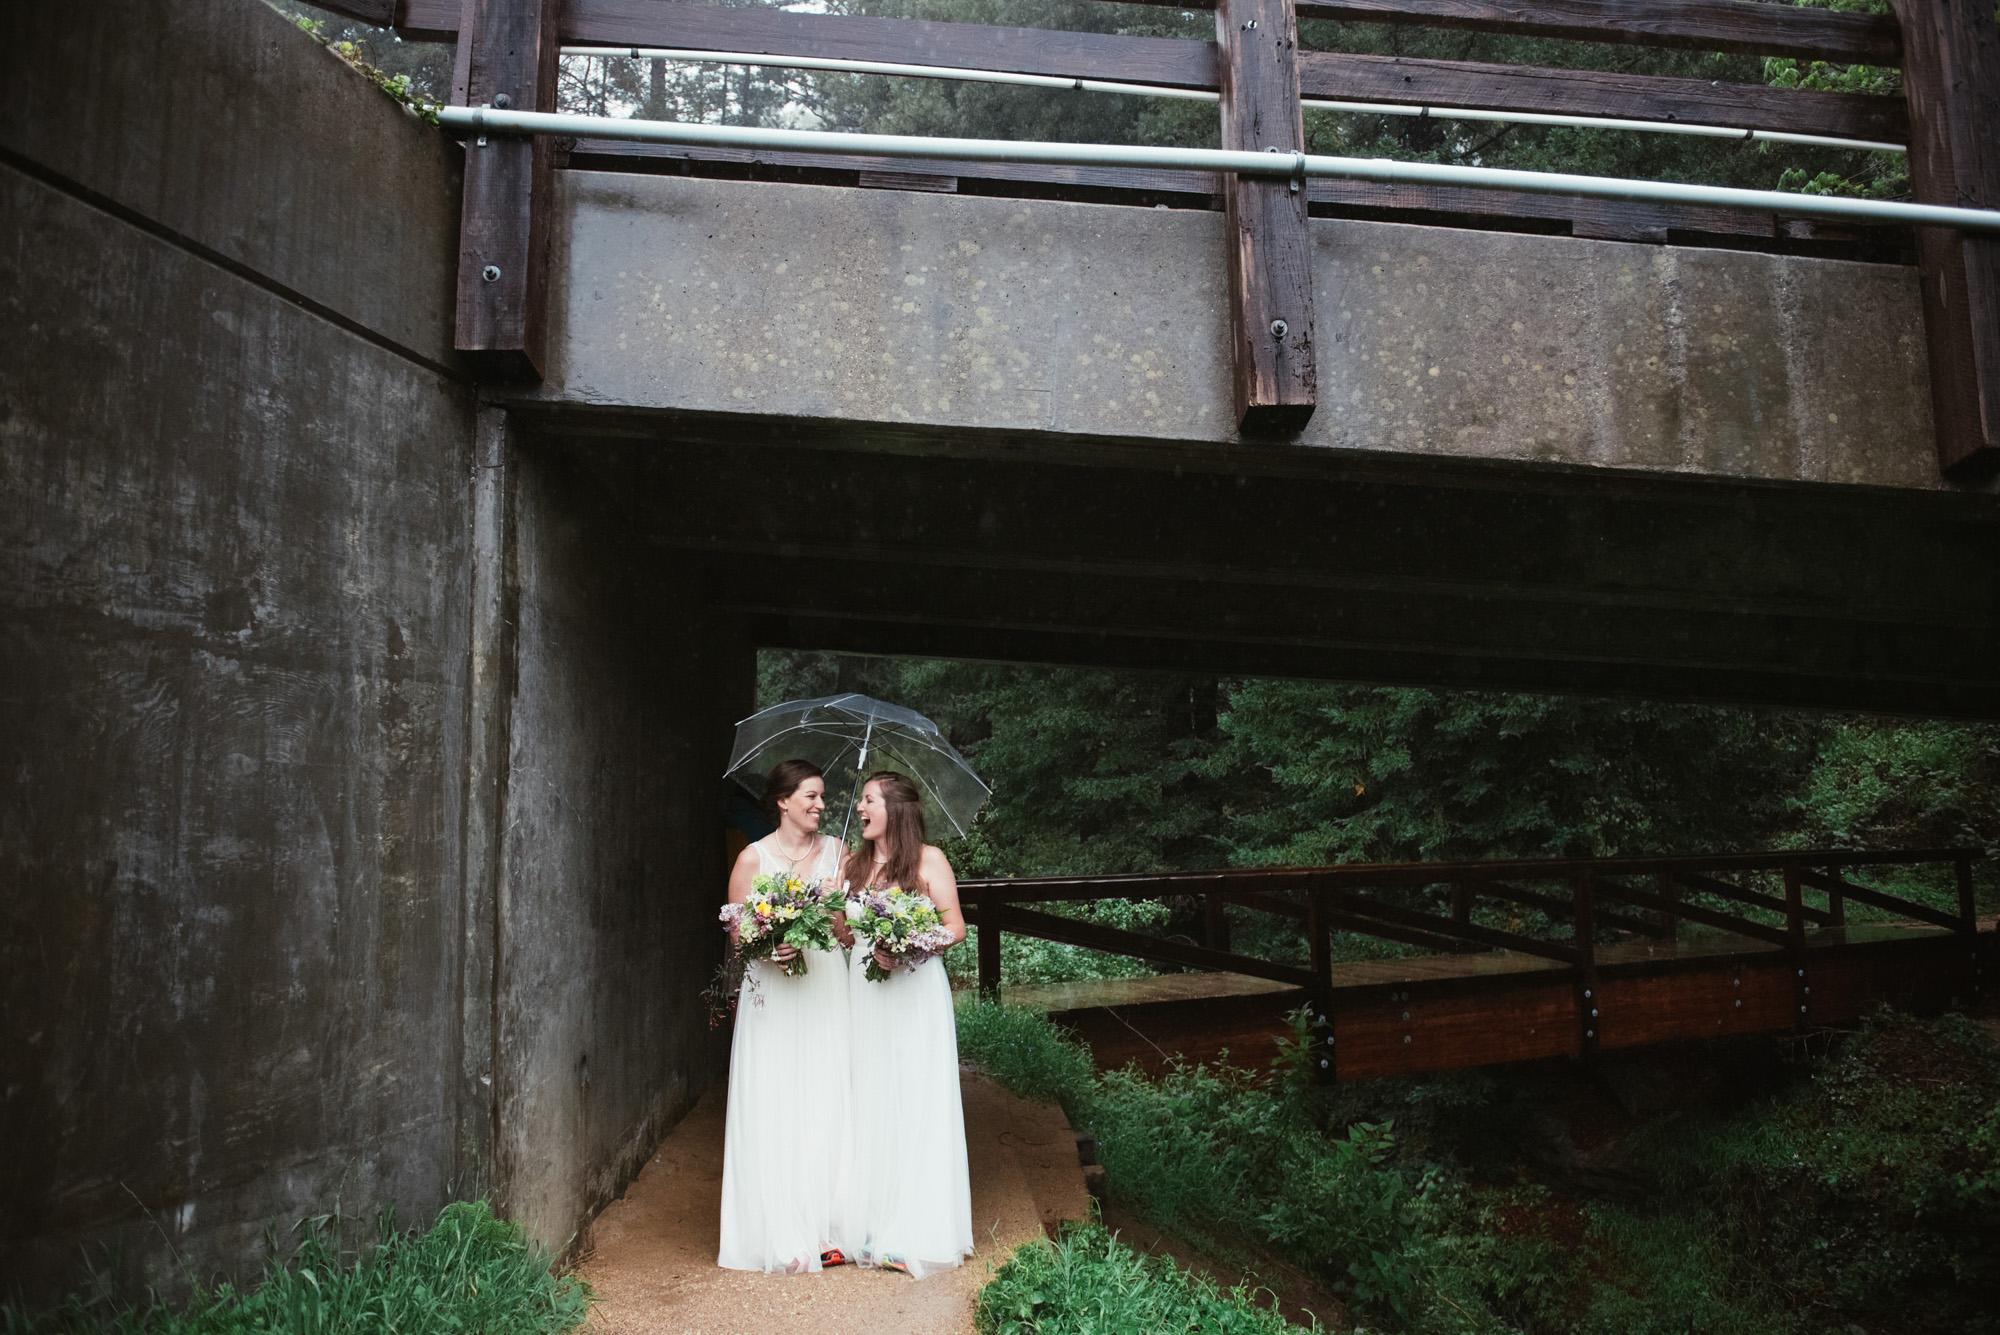 LGBTQ elope two brides laughing